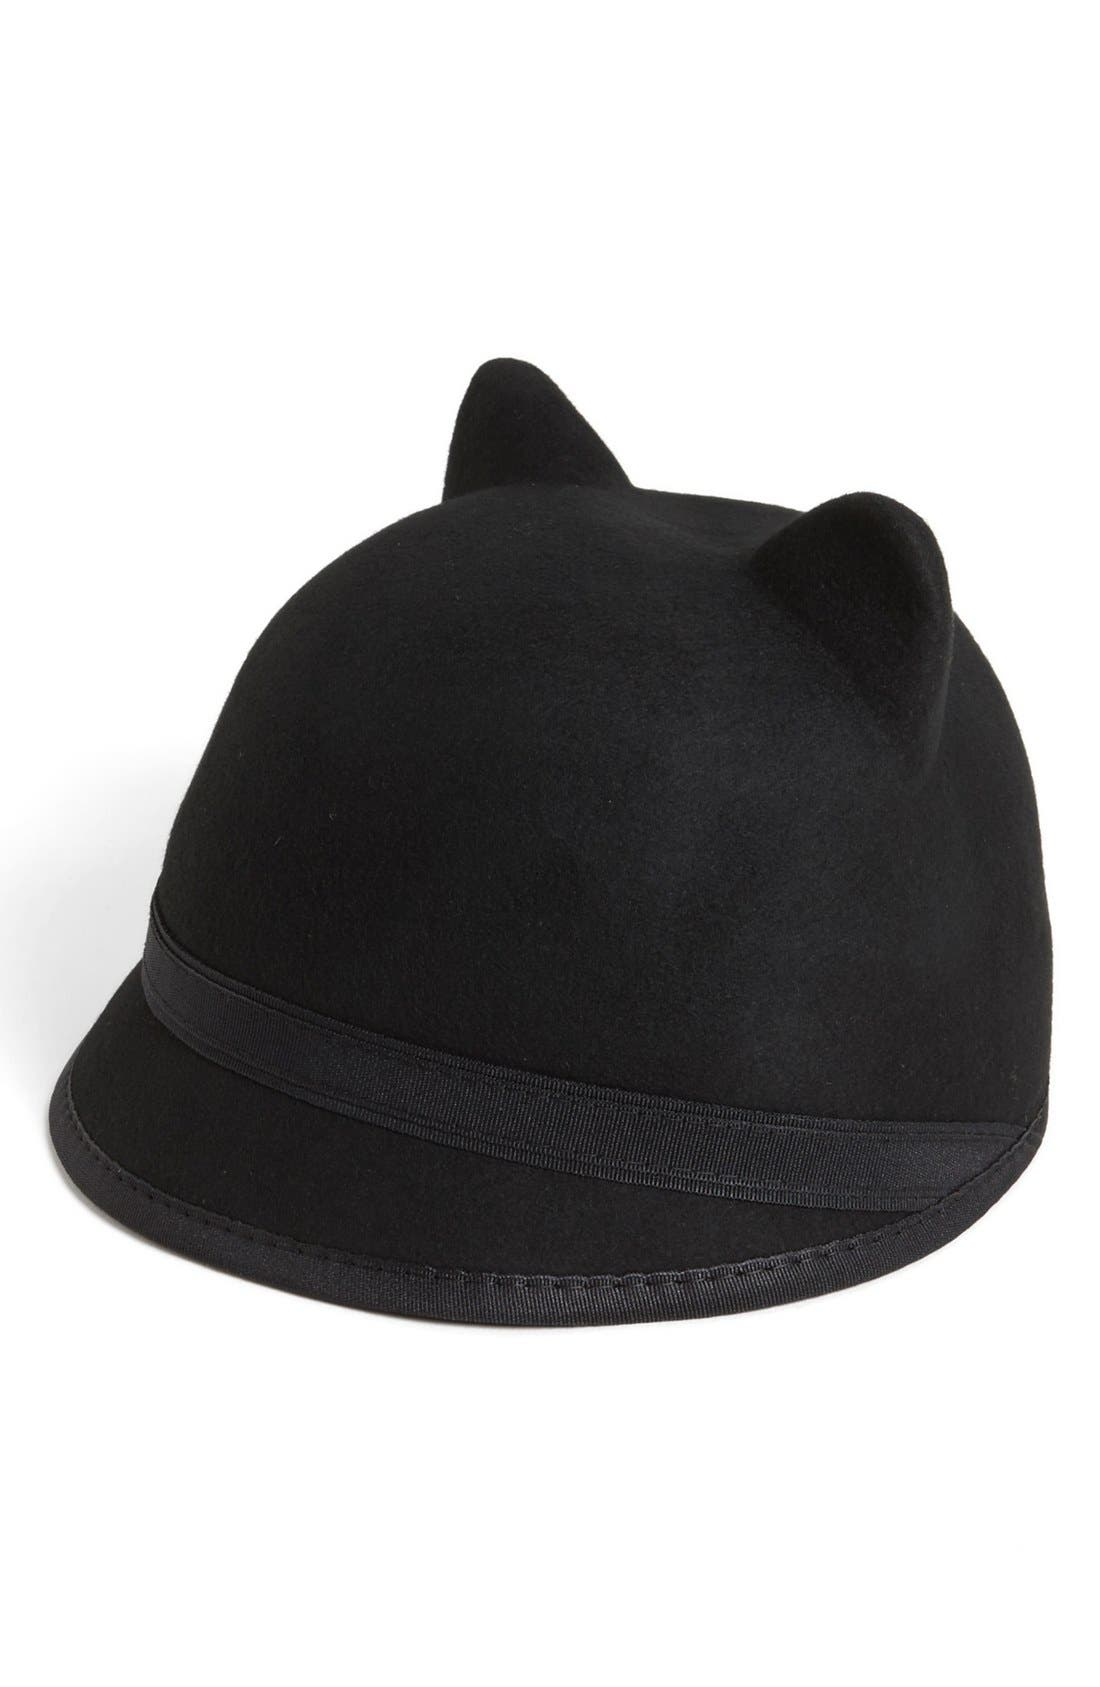 BCBG AXAZRIA Kitty Cat Baseball Cap, Main, color, 001